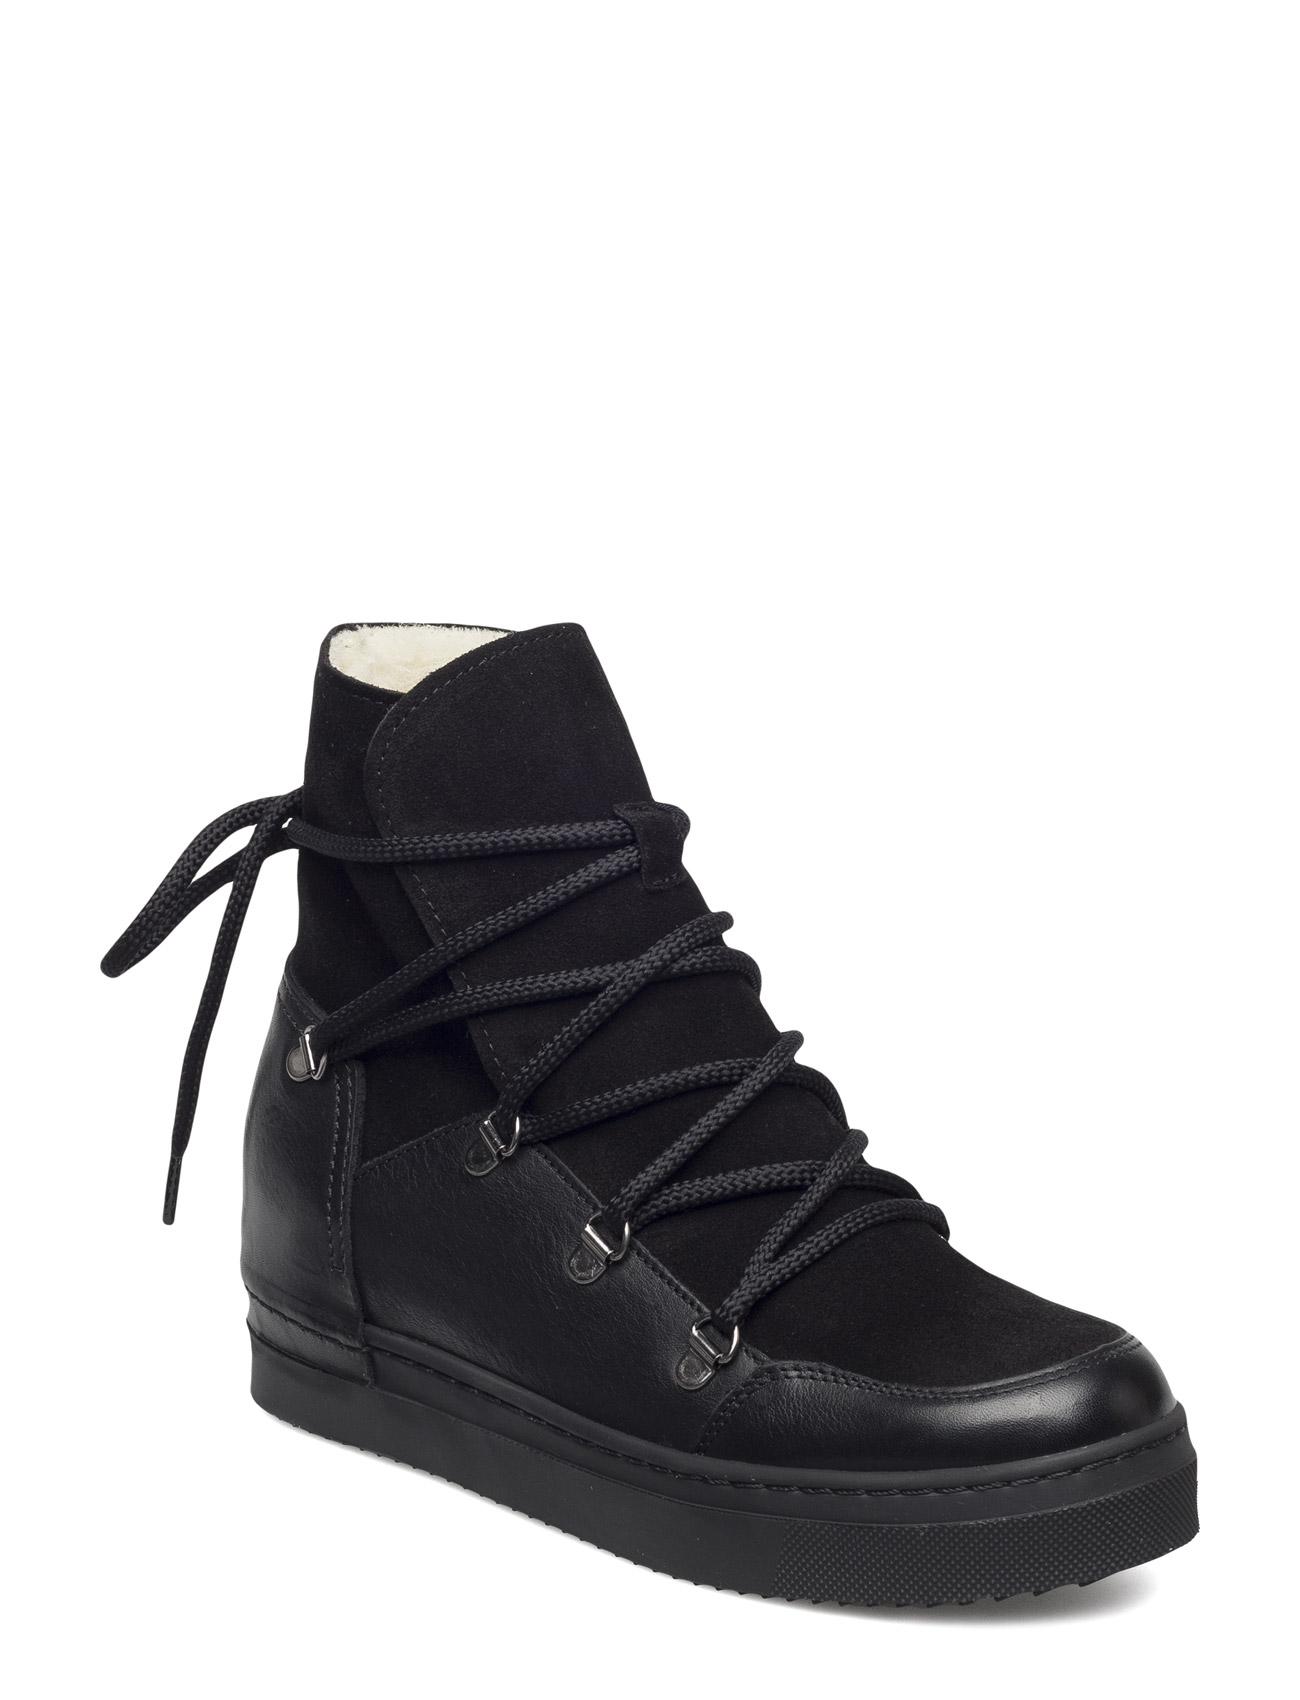 ae49c9d5c4f Billi Bi Boots (Black Tomcat/suede Black S 850), (104 €) | Large ...